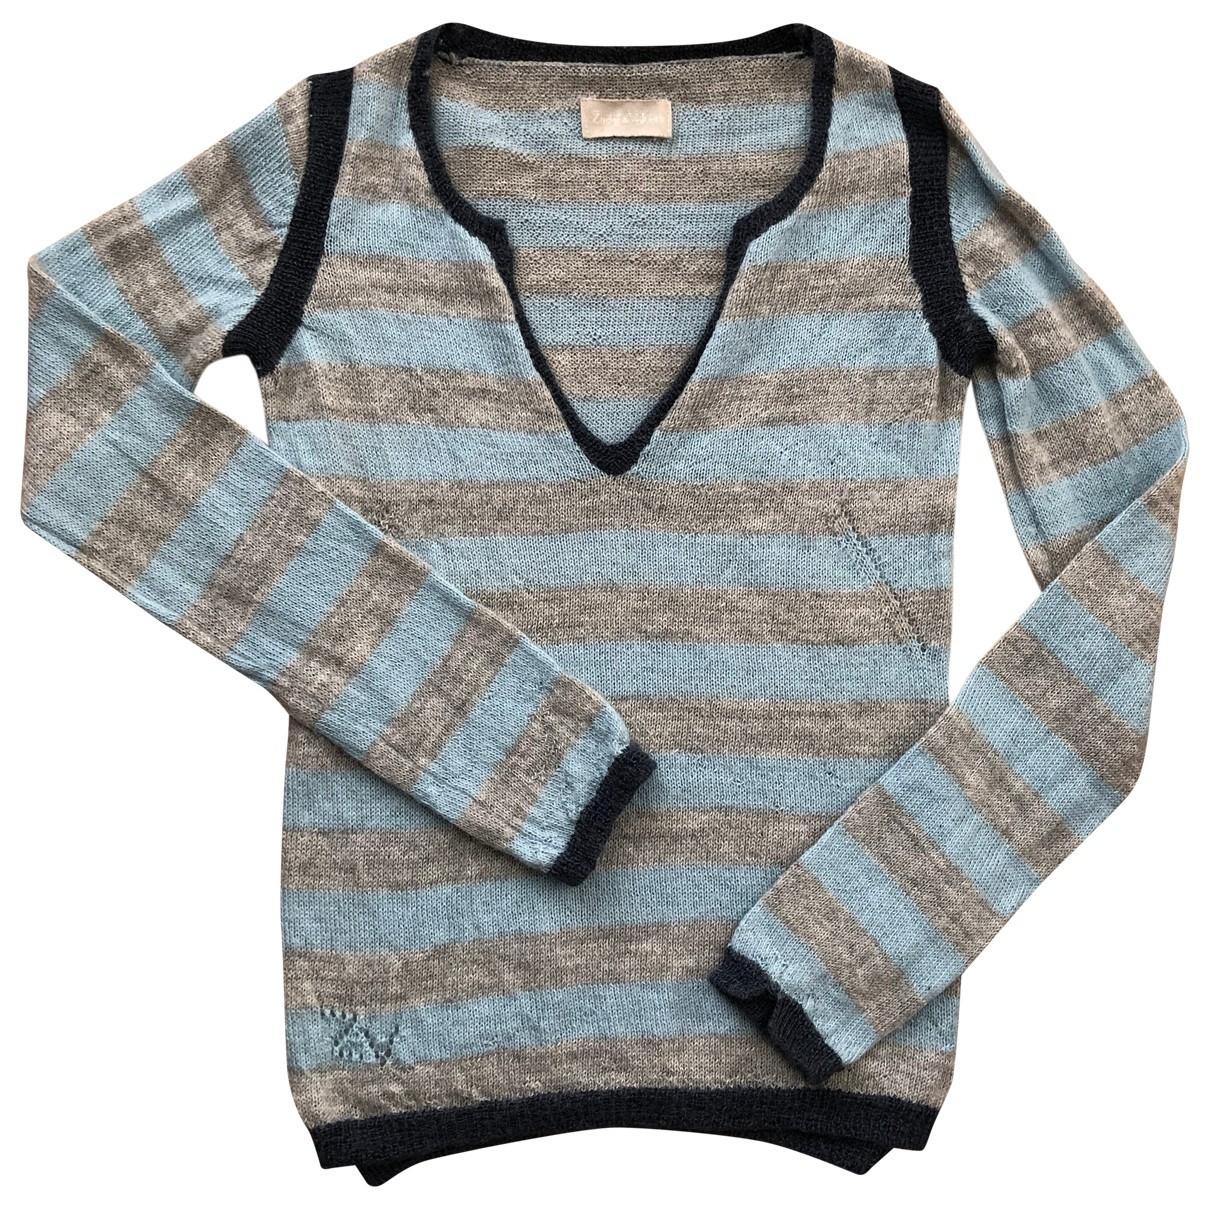 Zadig & Voltaire \N Blue Wool Knitwear for Women S International